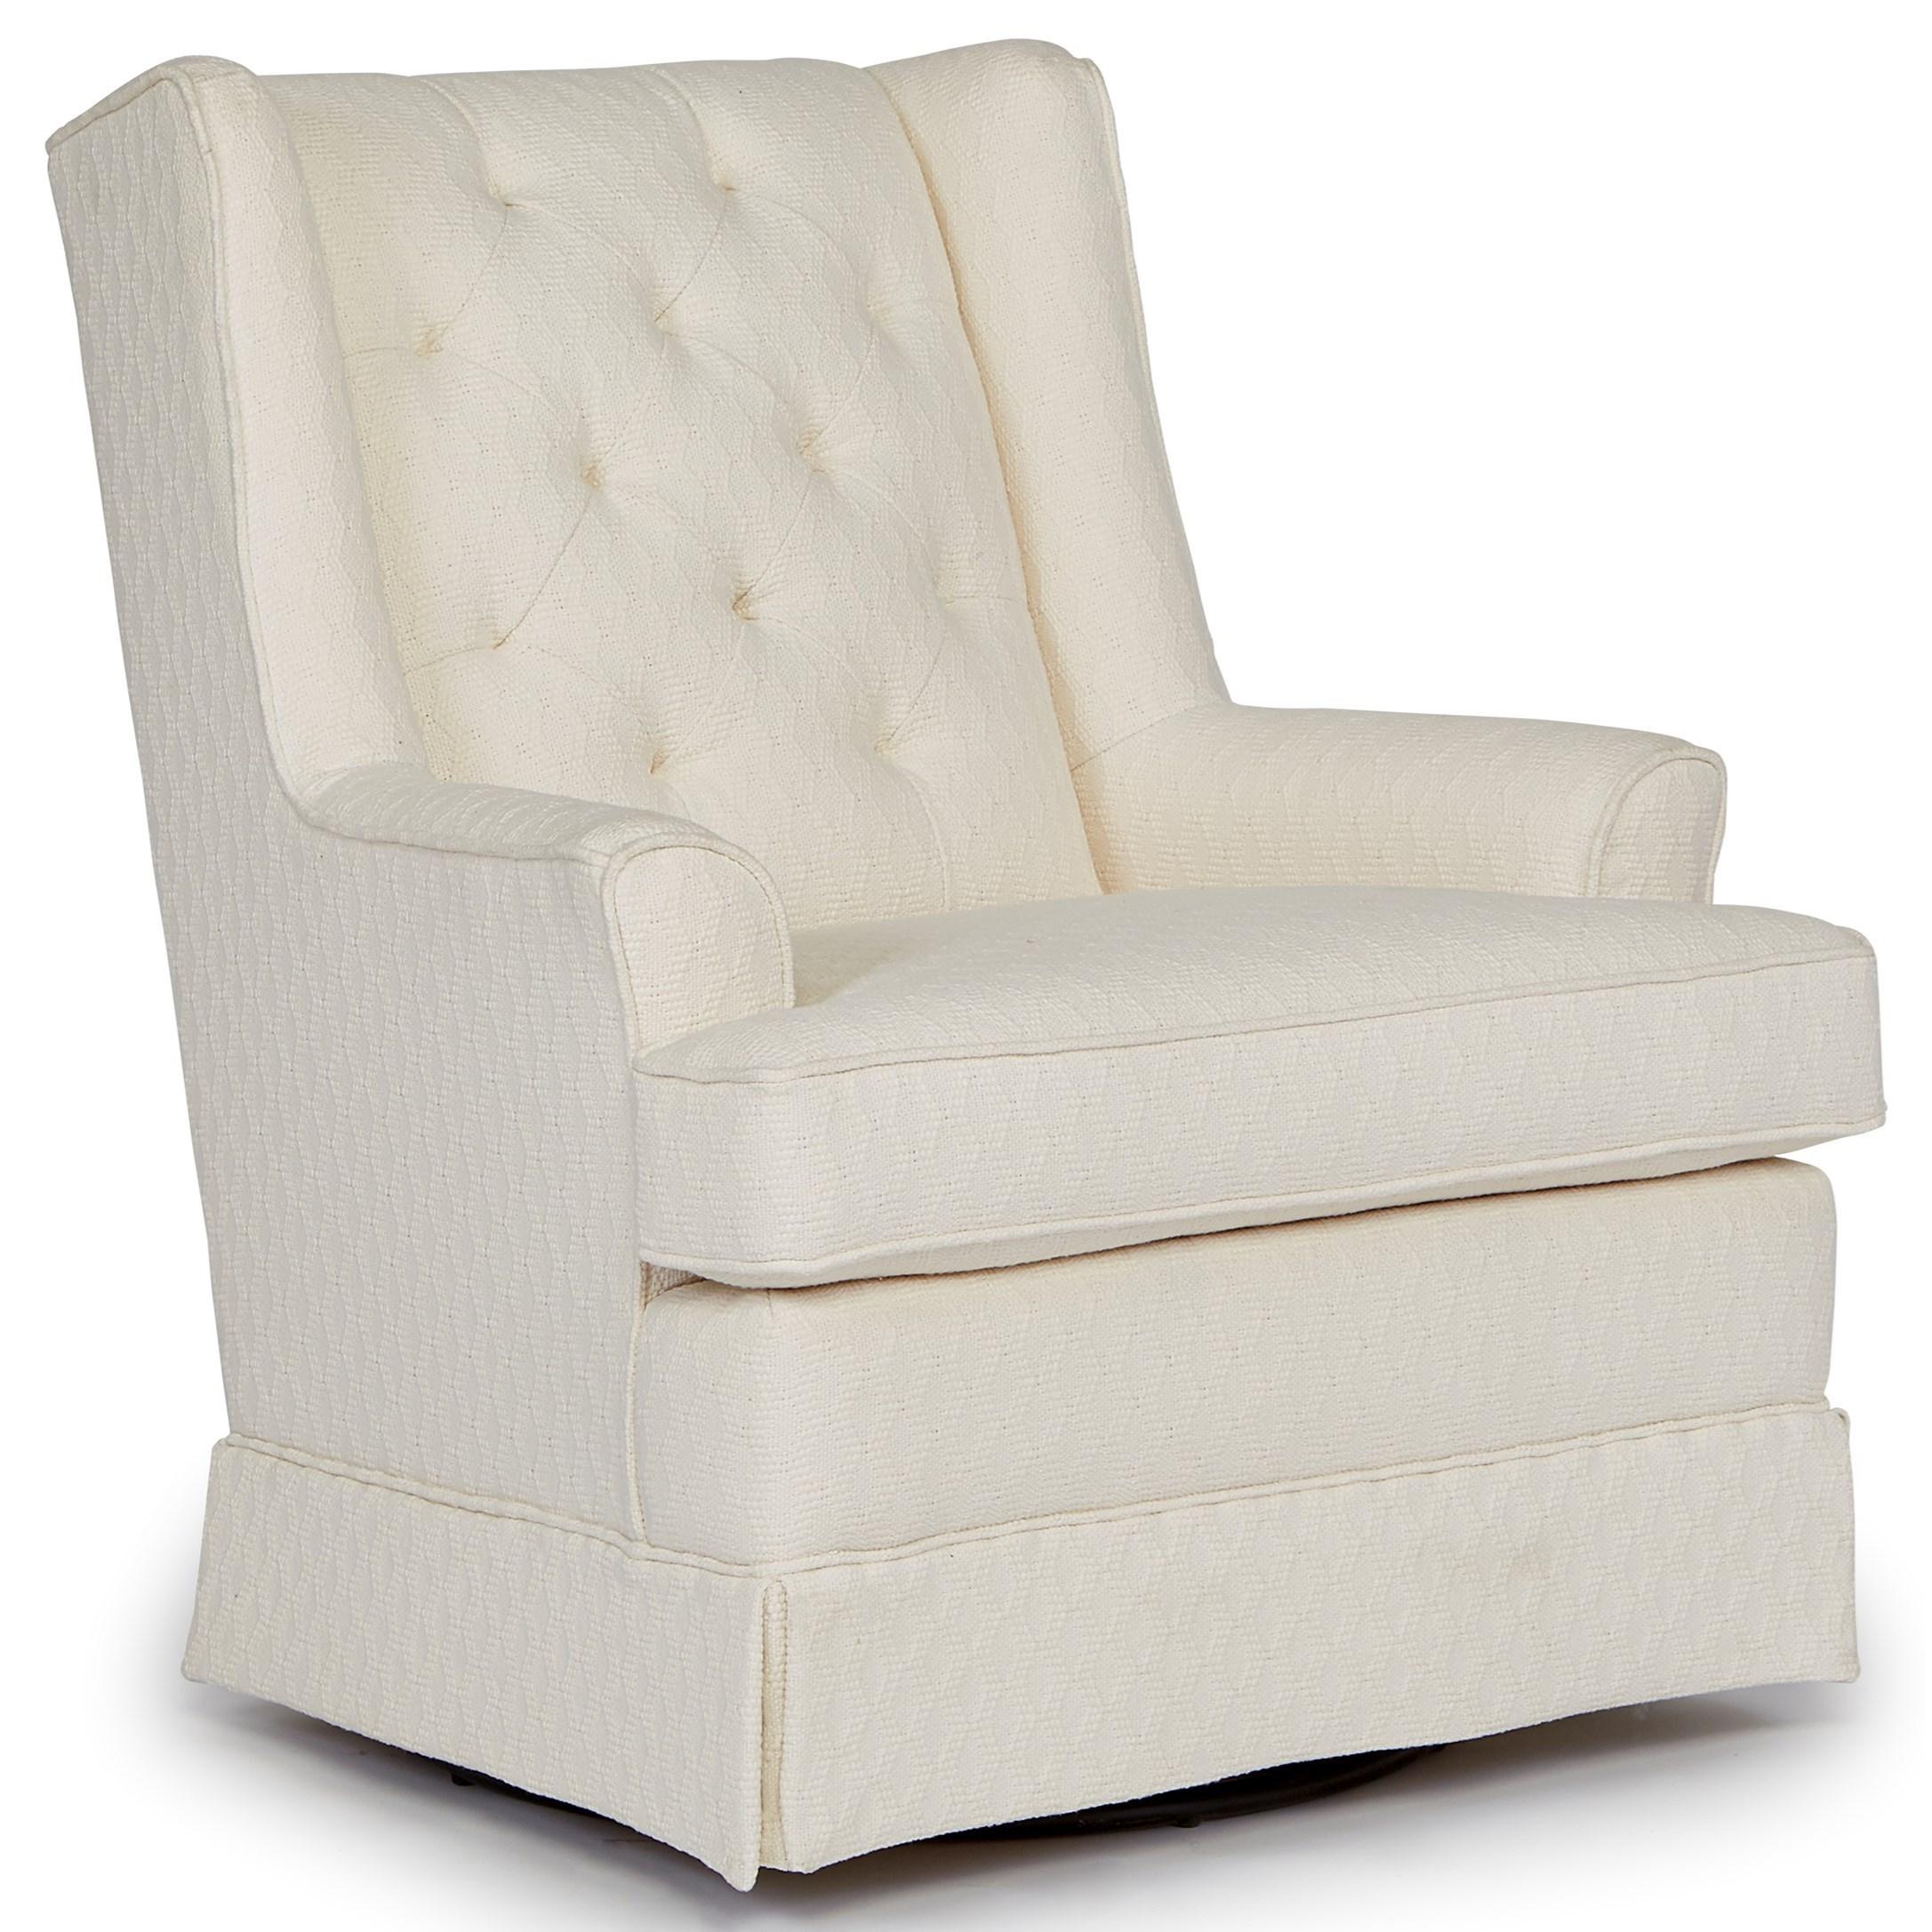 Swivel Glide Chairs Swivel Glider